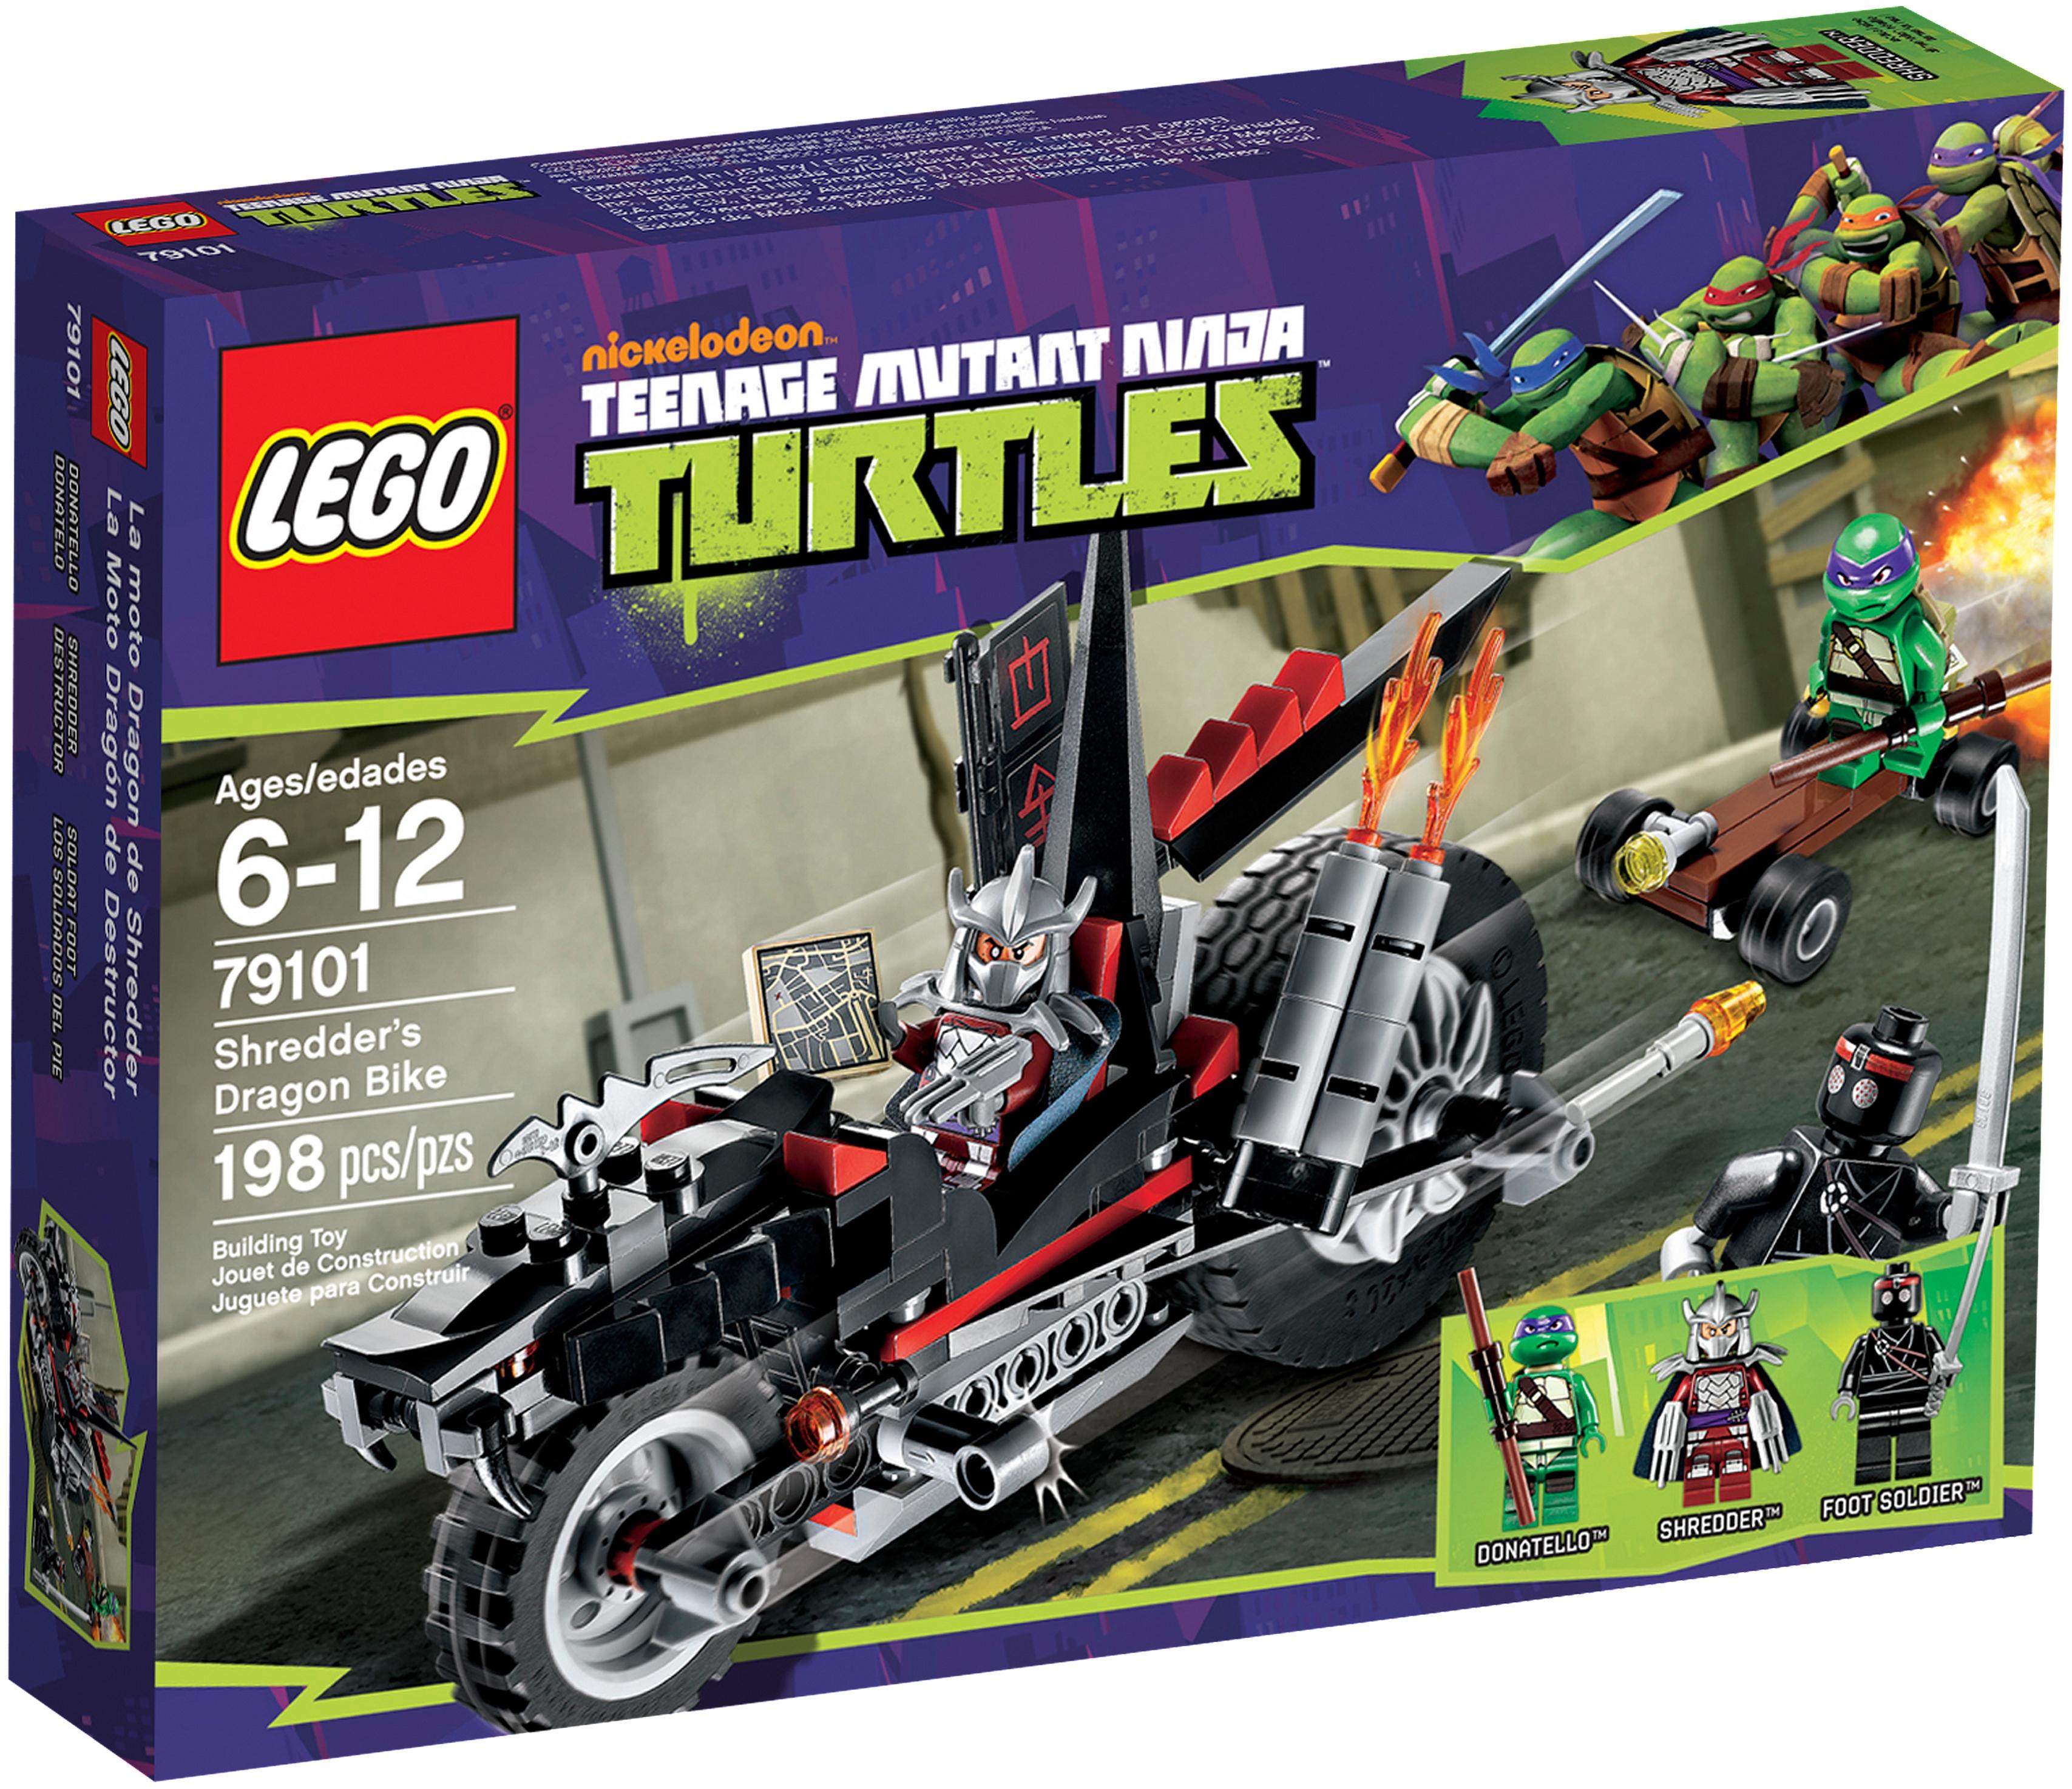 79101 Shredder's Dragon Bike